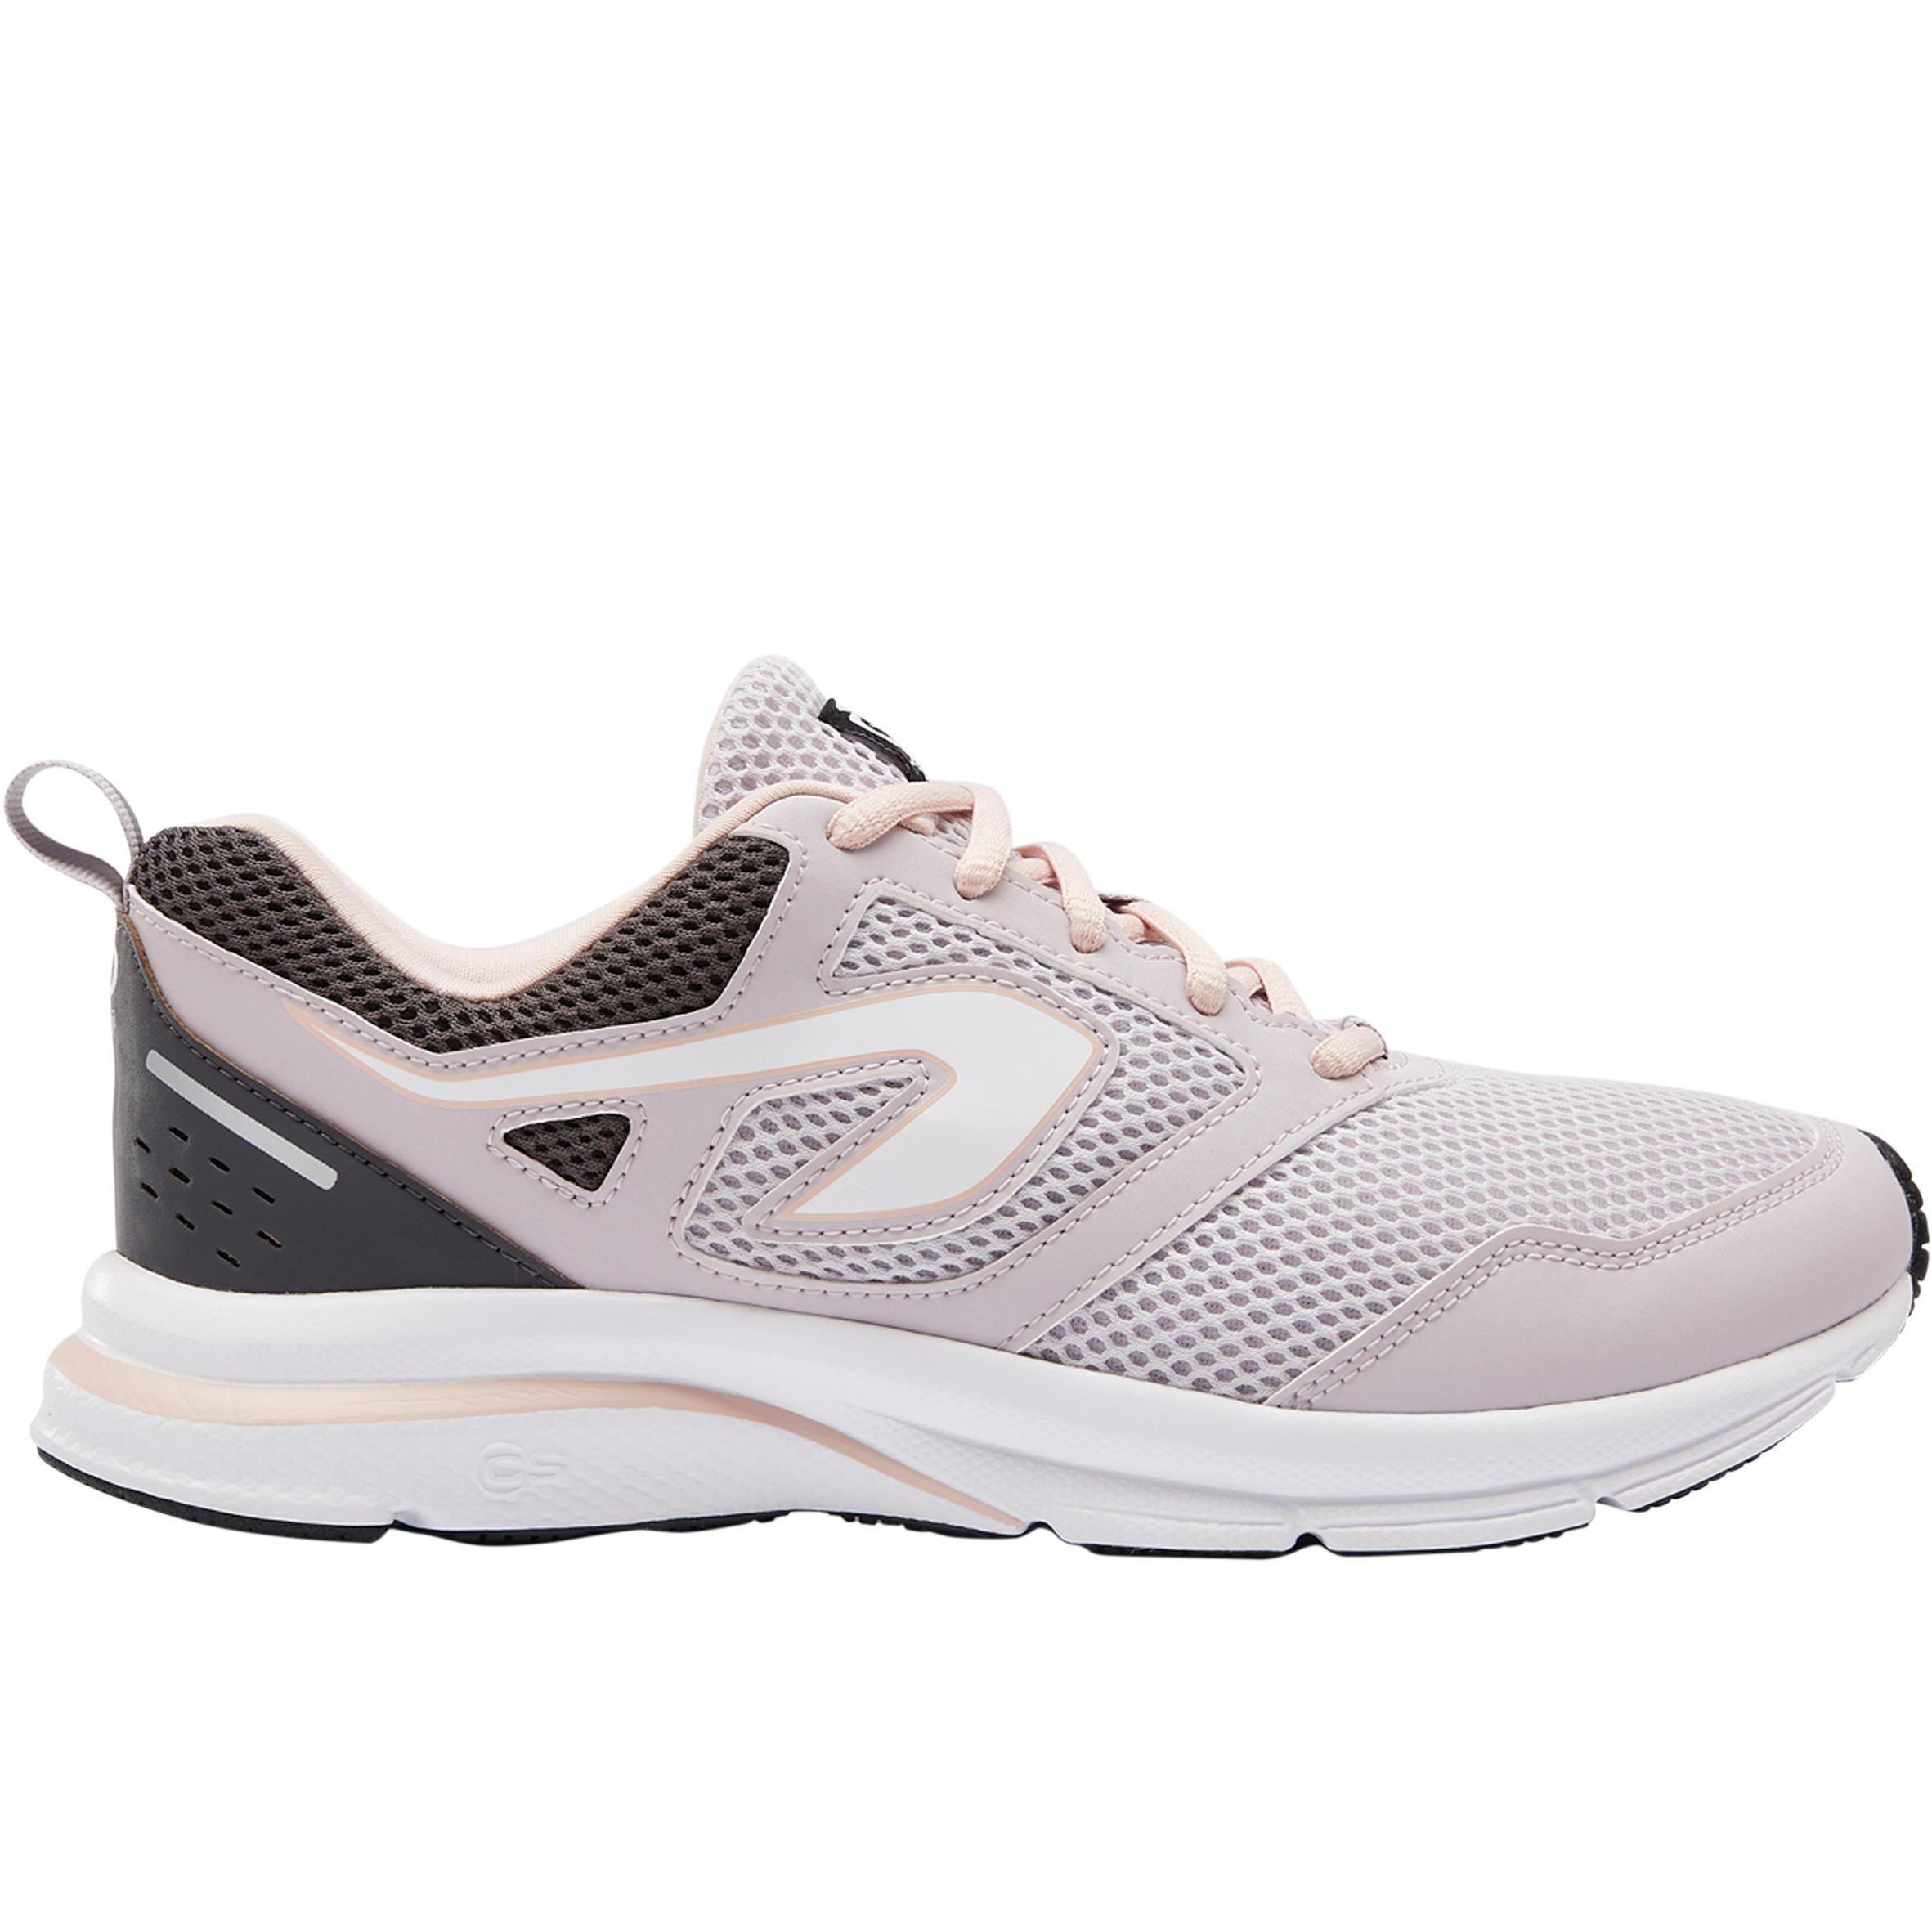 Laufschuhe Run Active Damen | Schuhe > Sportschuhe > Laufschuhe | Kalenji